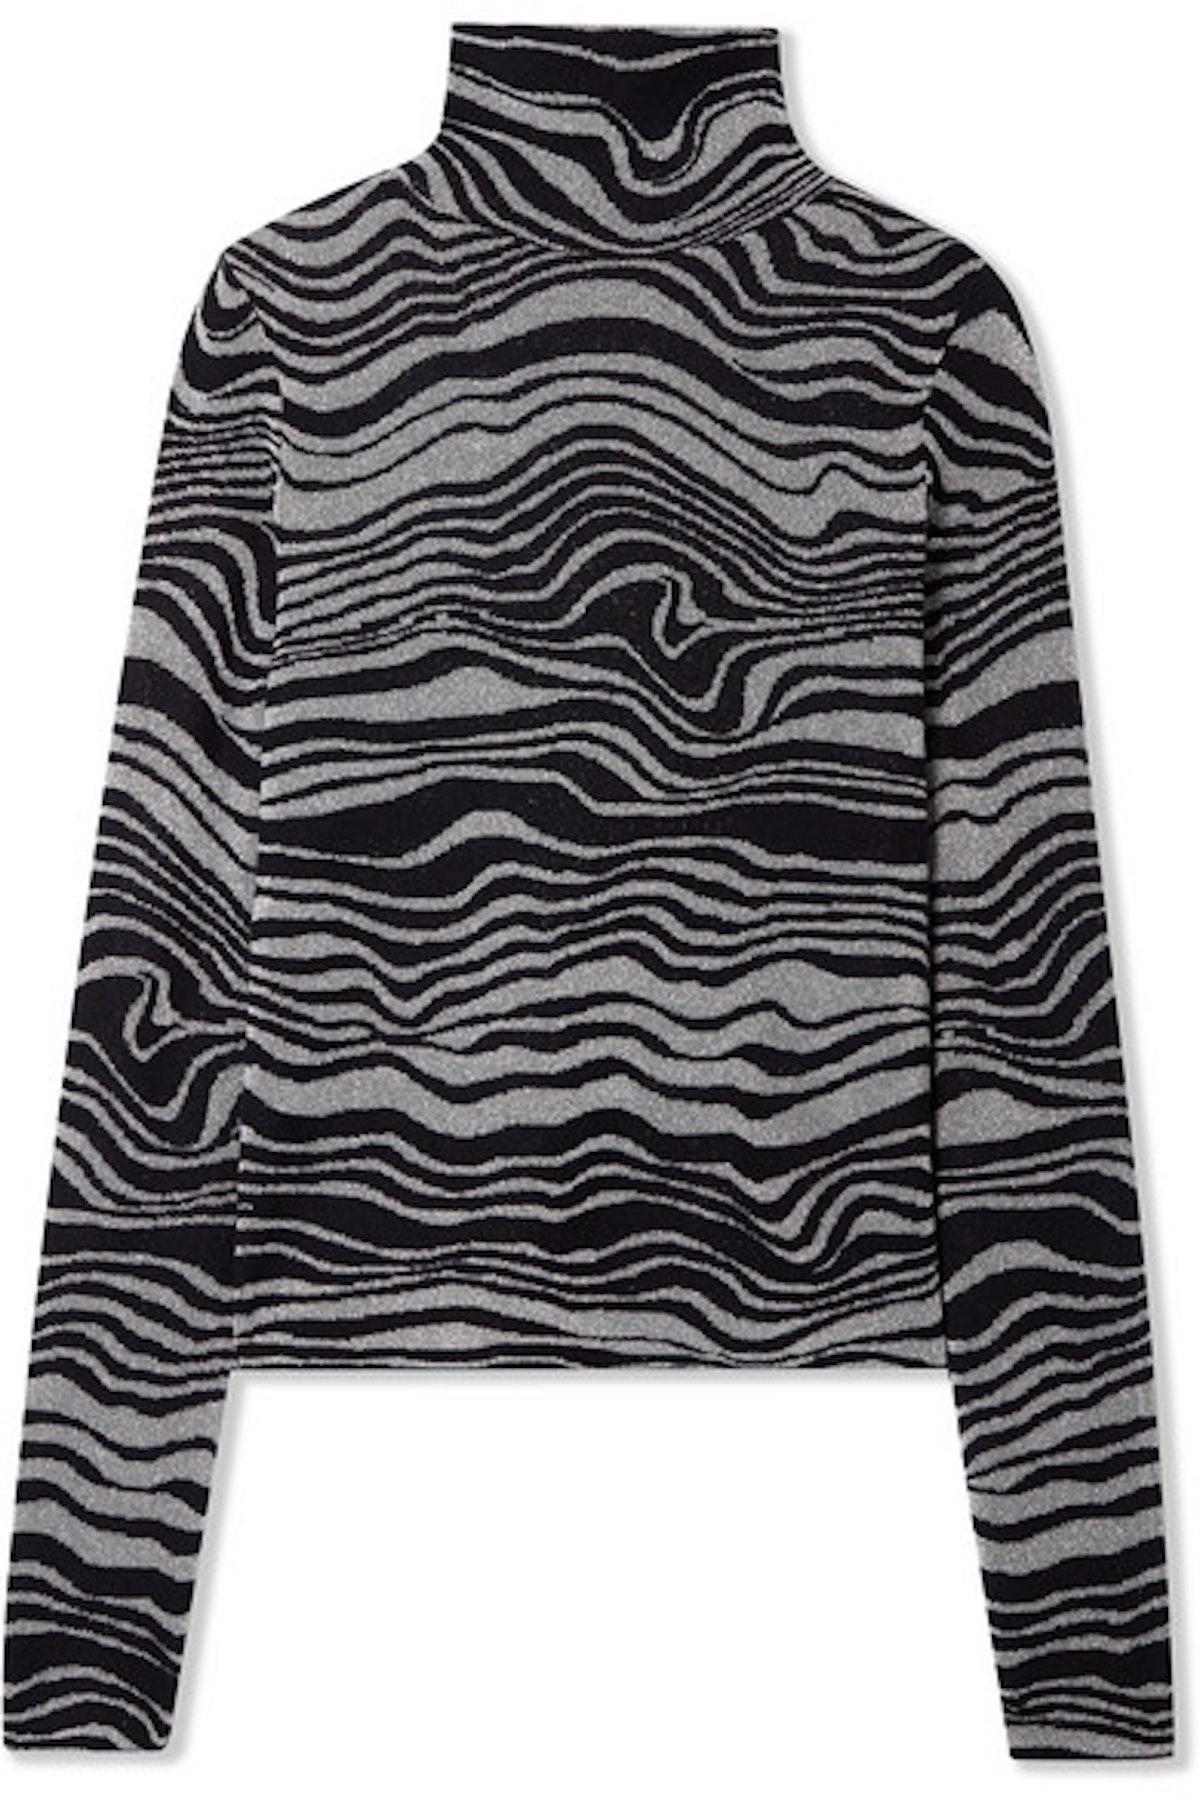 Sies Marjan Roos Cashmere-Blend Jacquard And Lurex Turtleneck Sweater